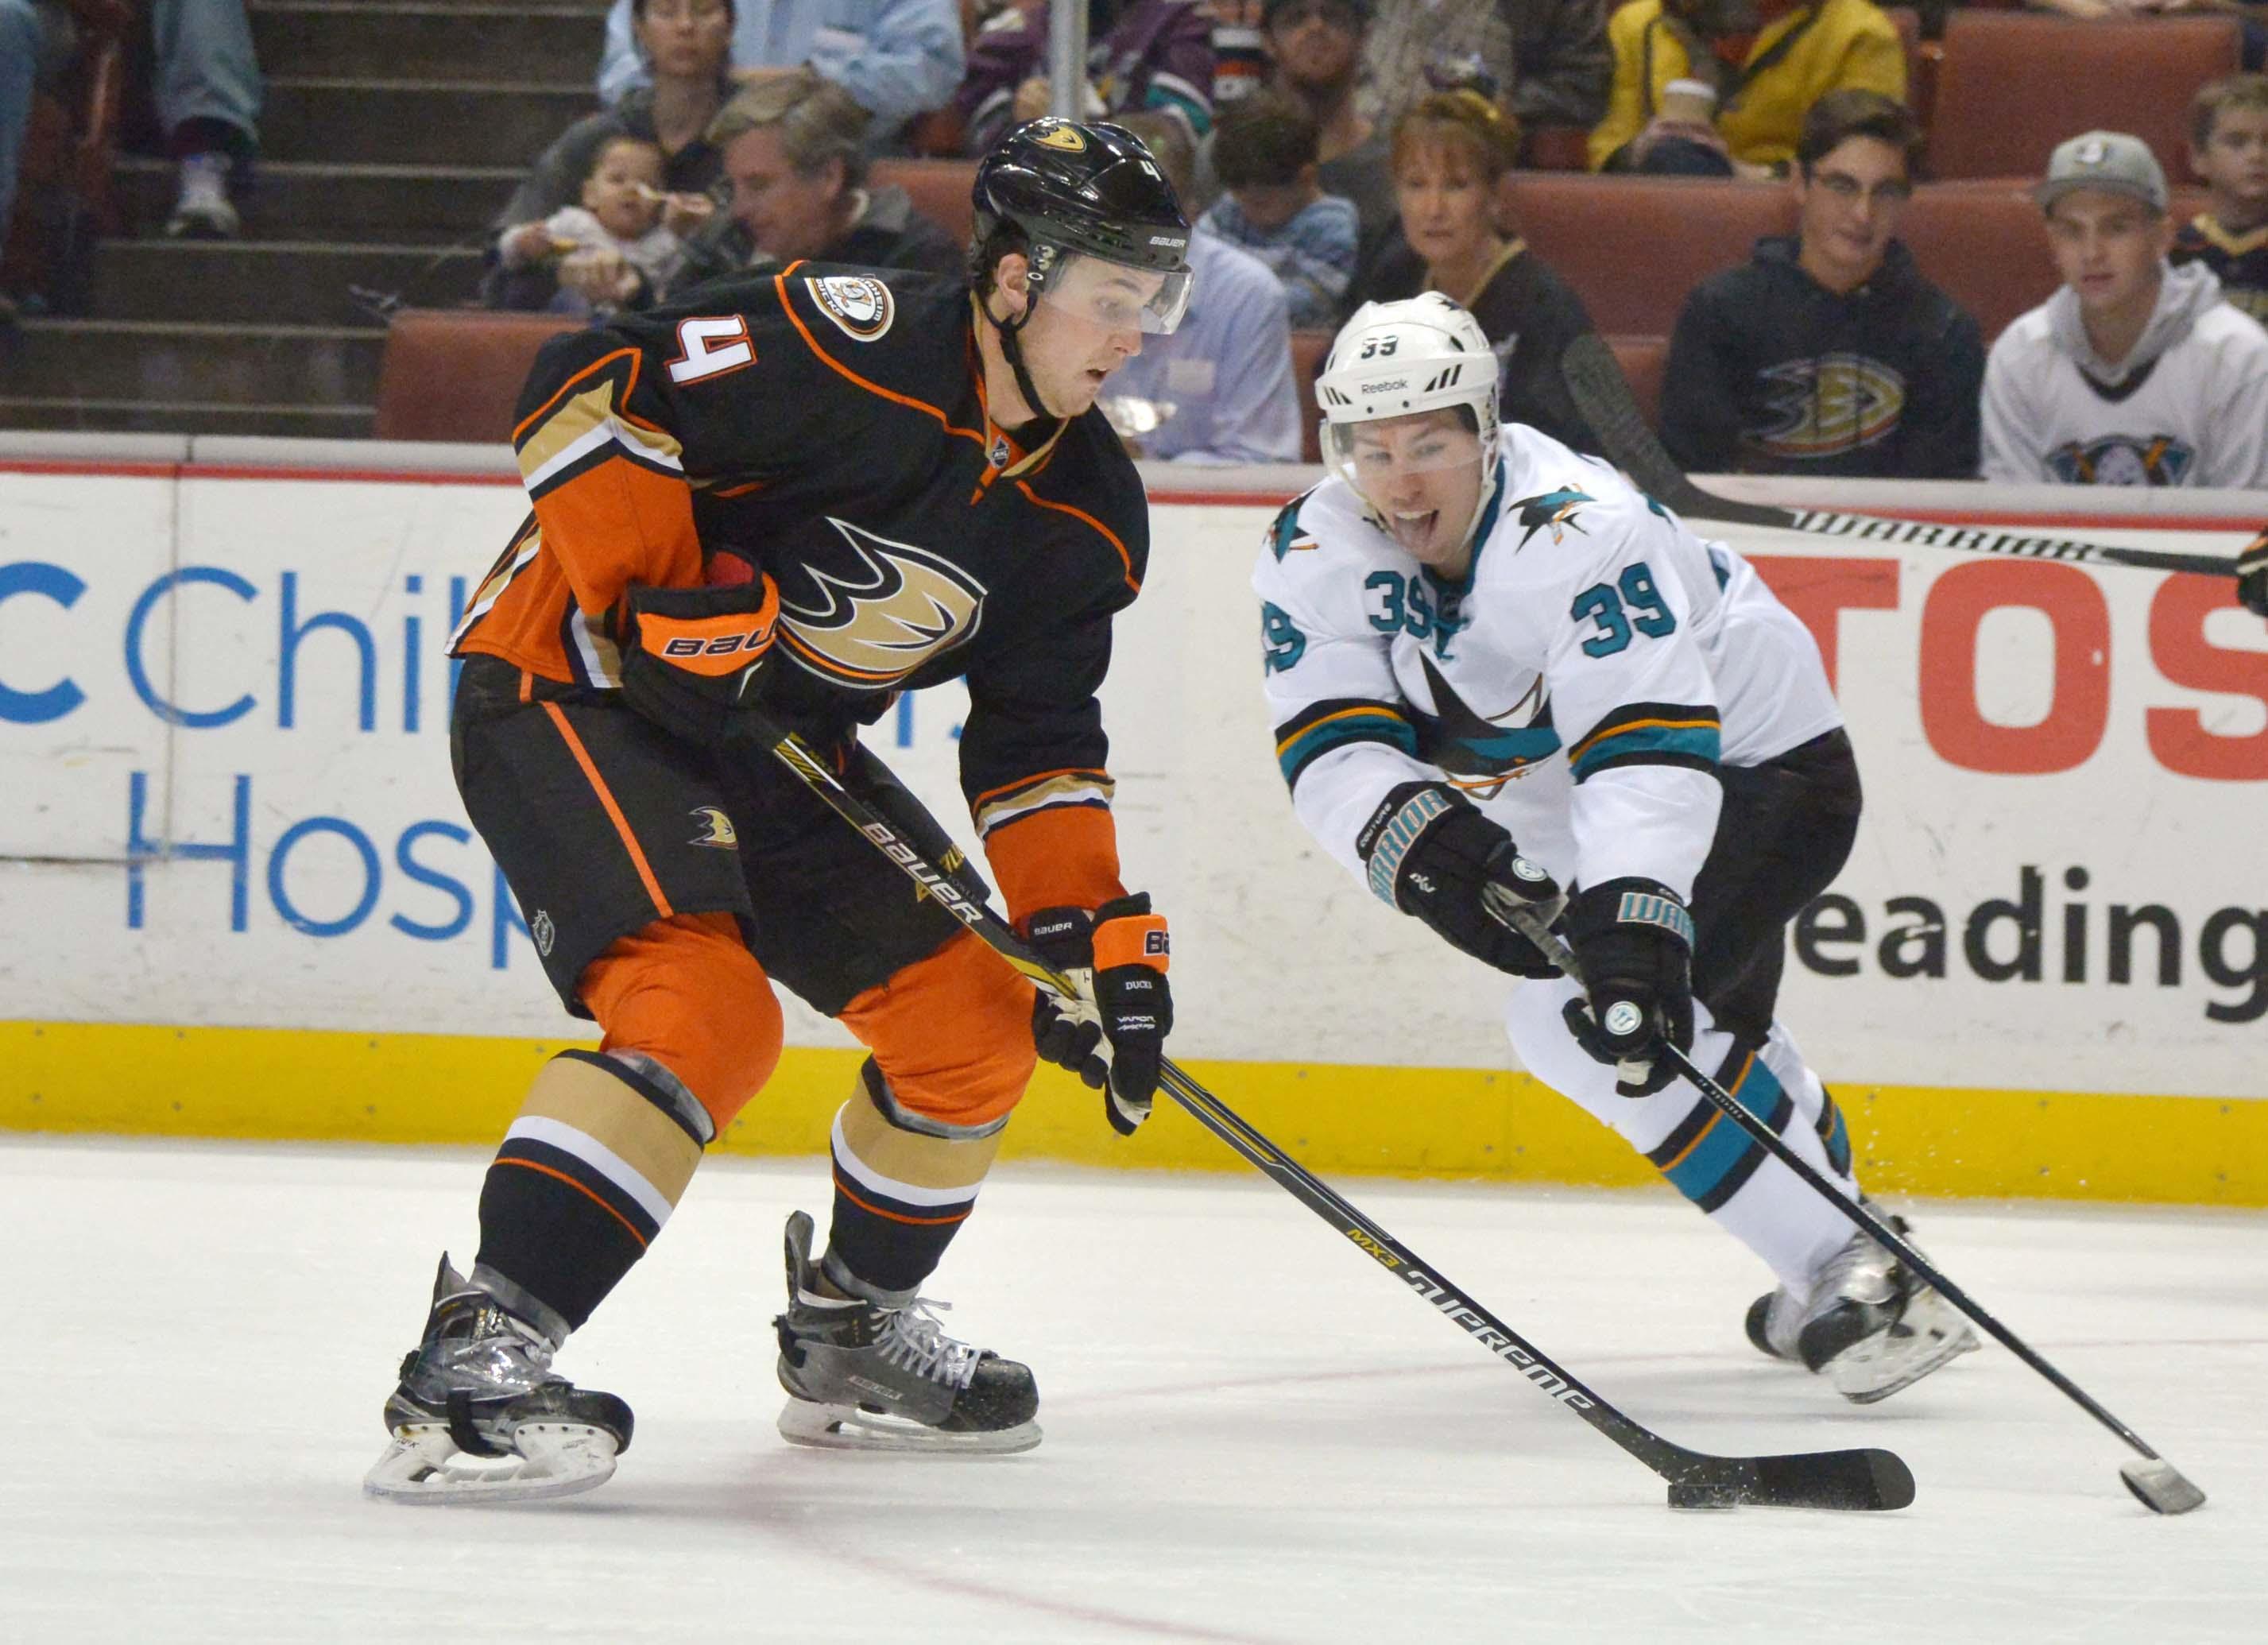 Cam Fowler handles the puck against the Sharks last season at Honda Center.